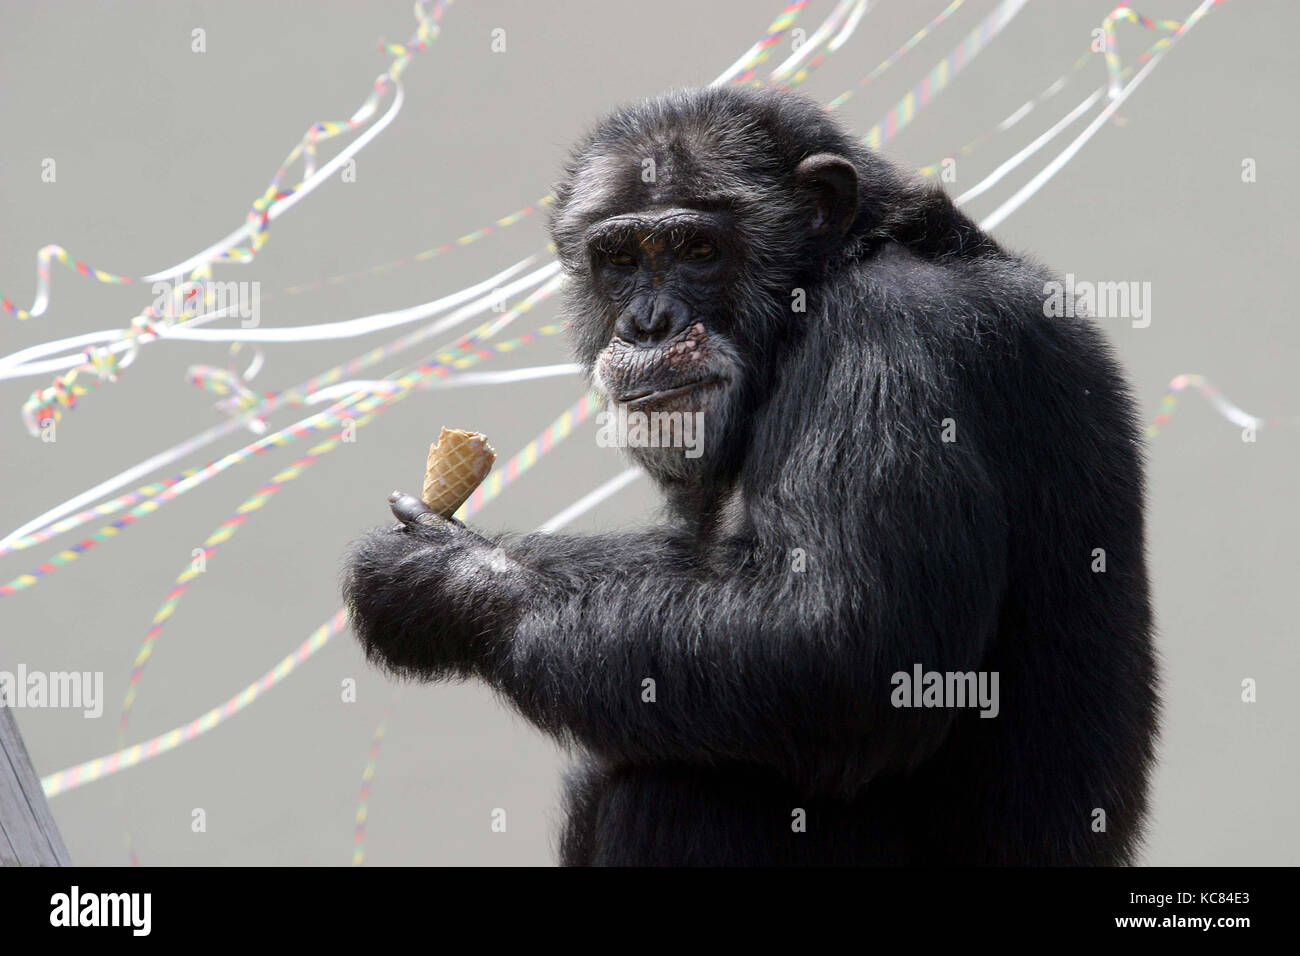 Topsy the chimpanzee celebrates her 40th birthday at Drayton Manor Park and Zoo, June 2005. Stock Photo